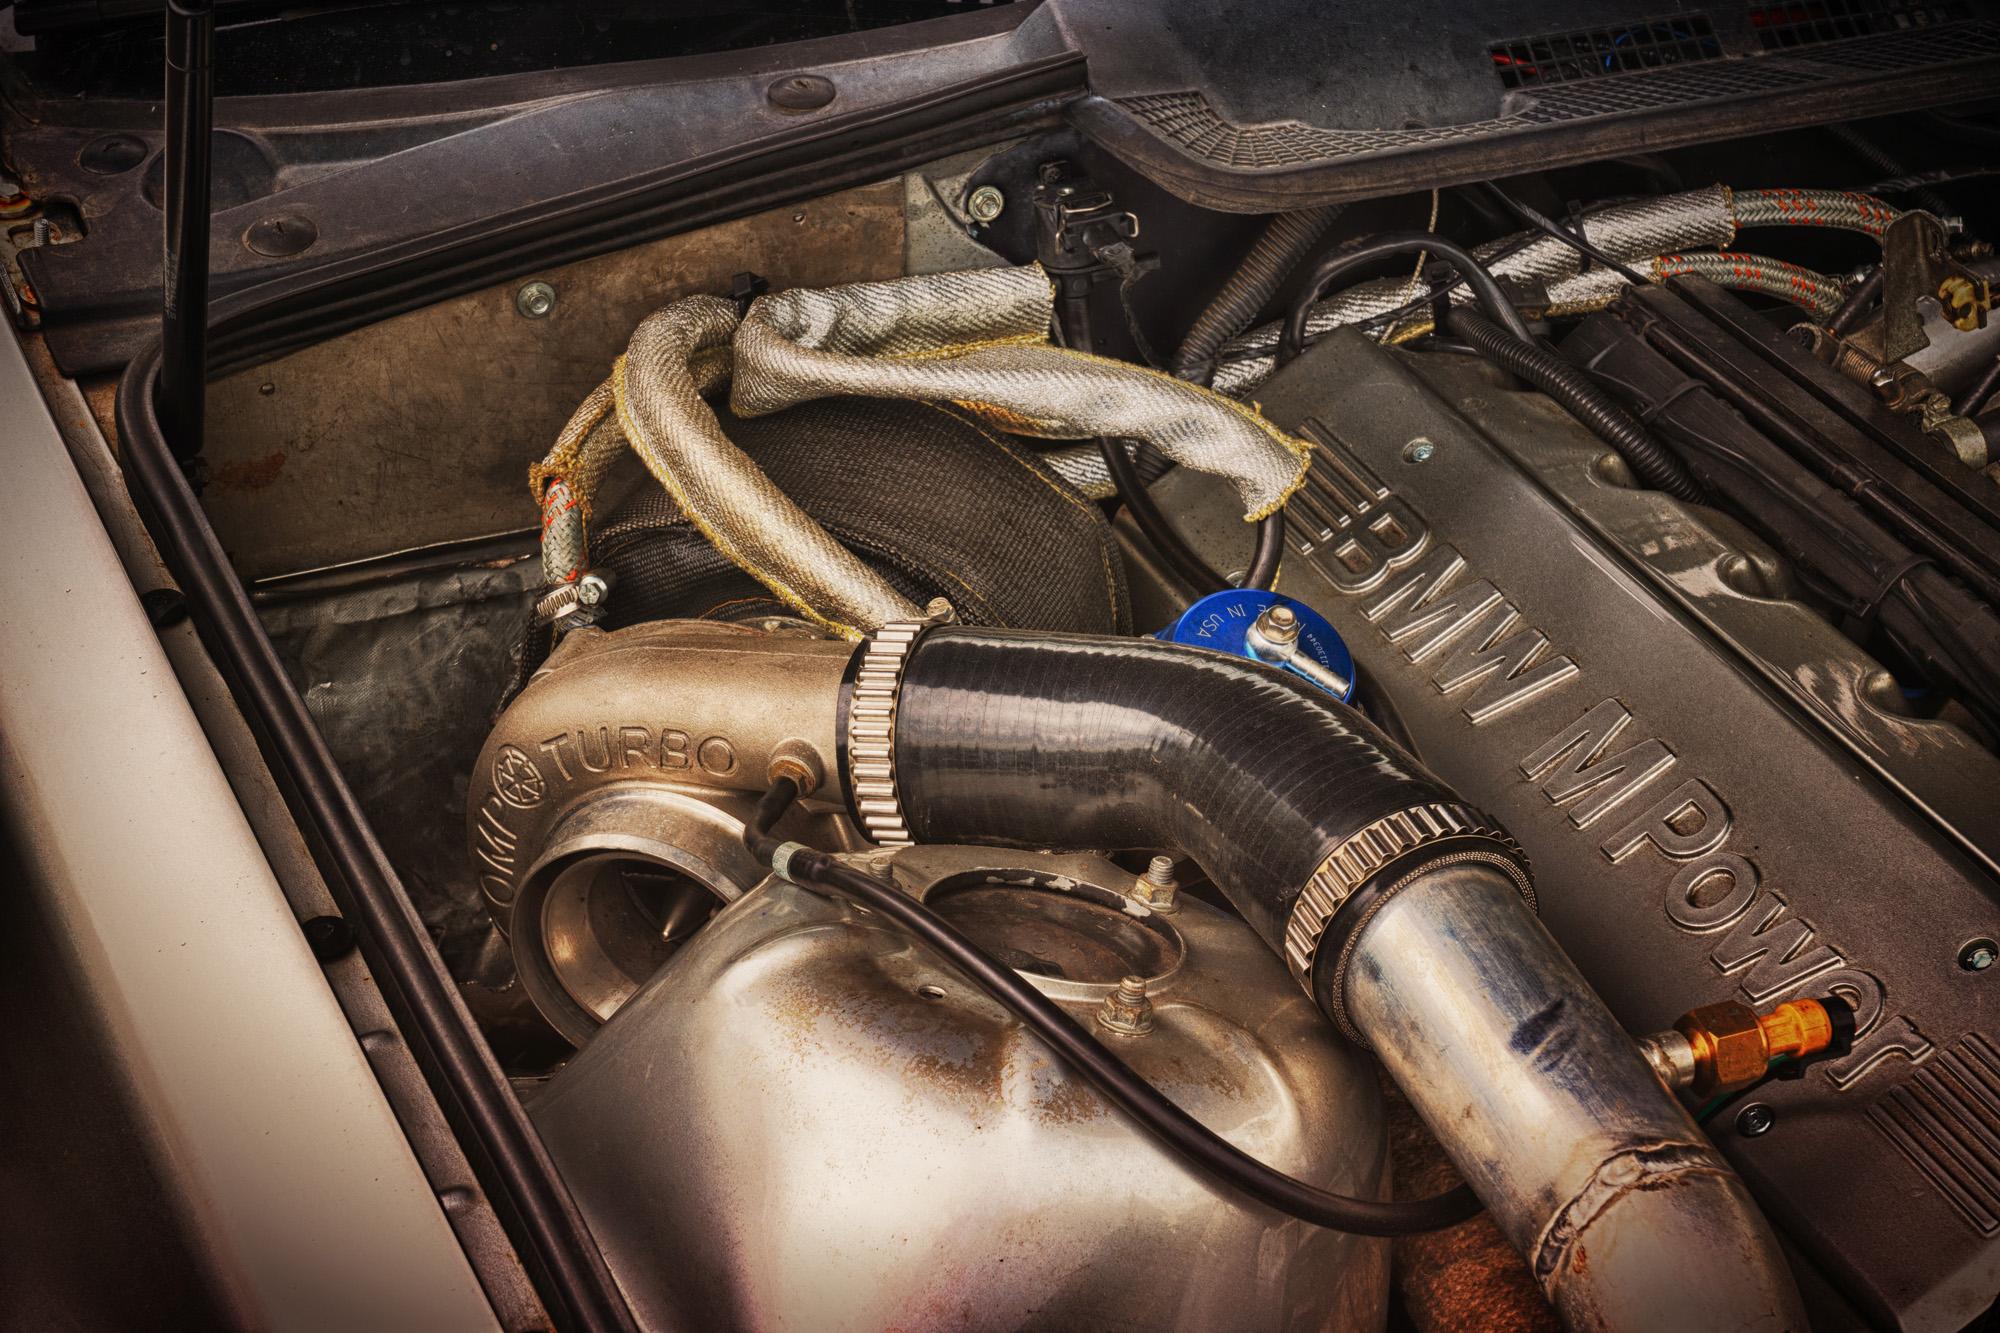 bmw-m3-e36-turbo-tr-carstyling-08